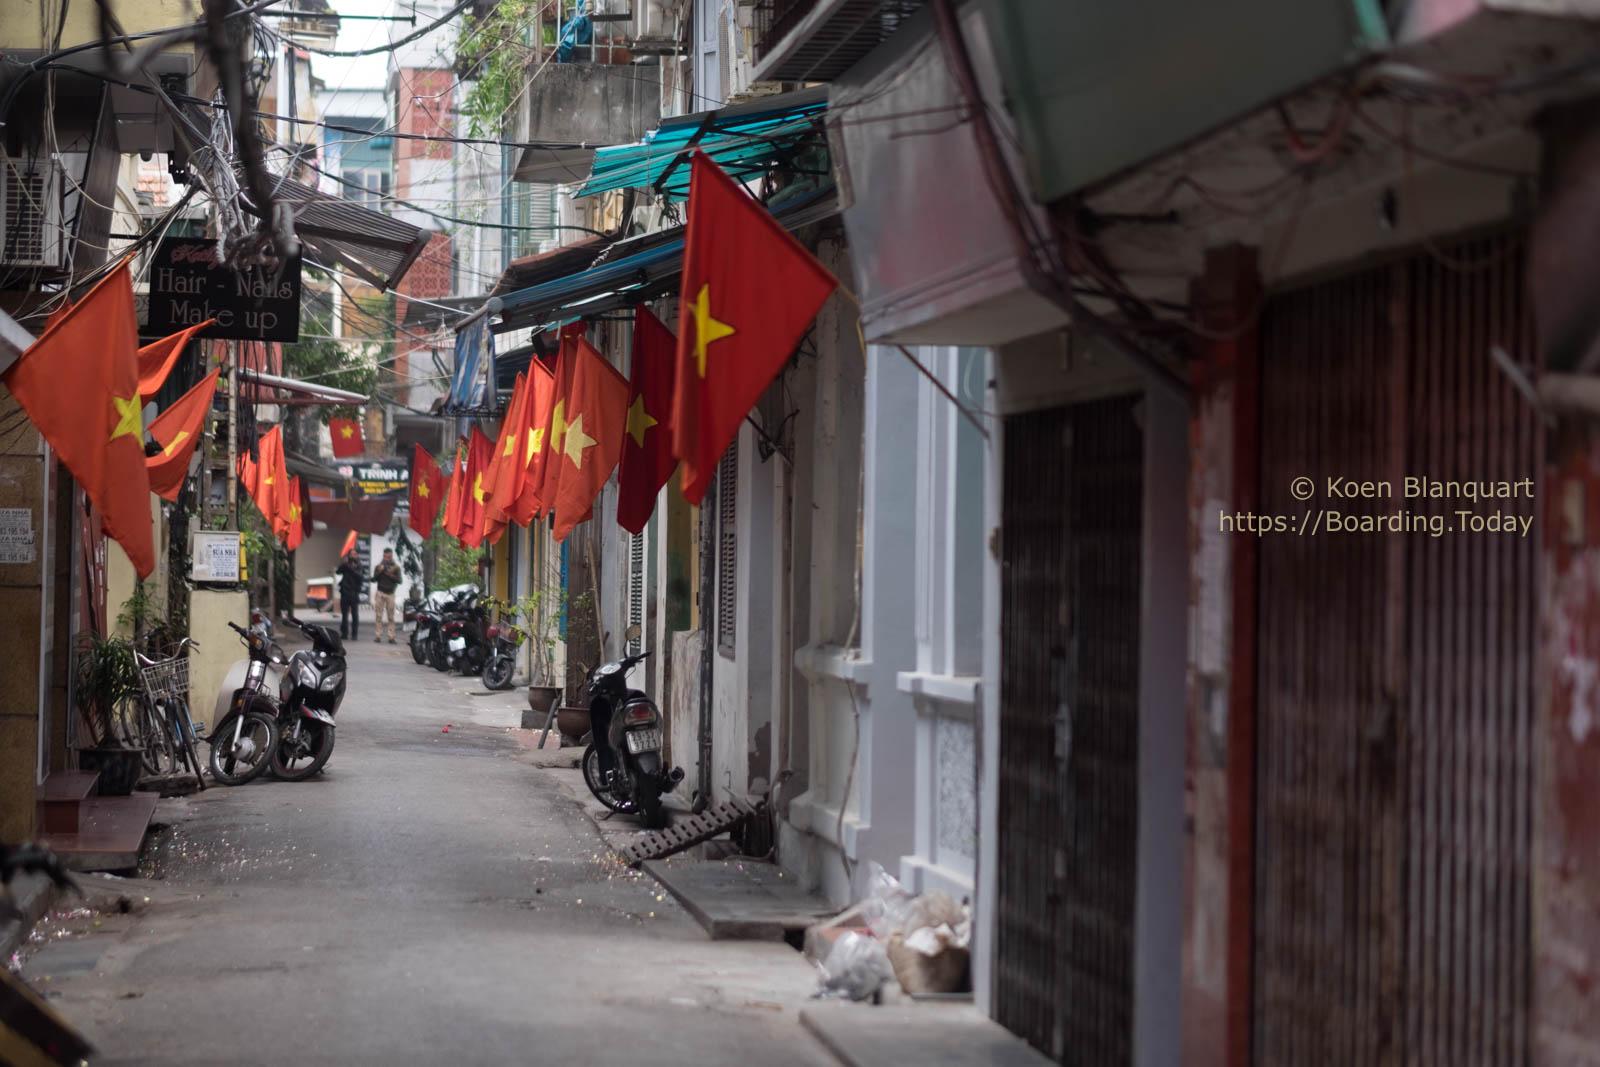 20170129-DSCF6512Hanoi, Vietnam by Koen Blanquart for Boarding.Today.jpg